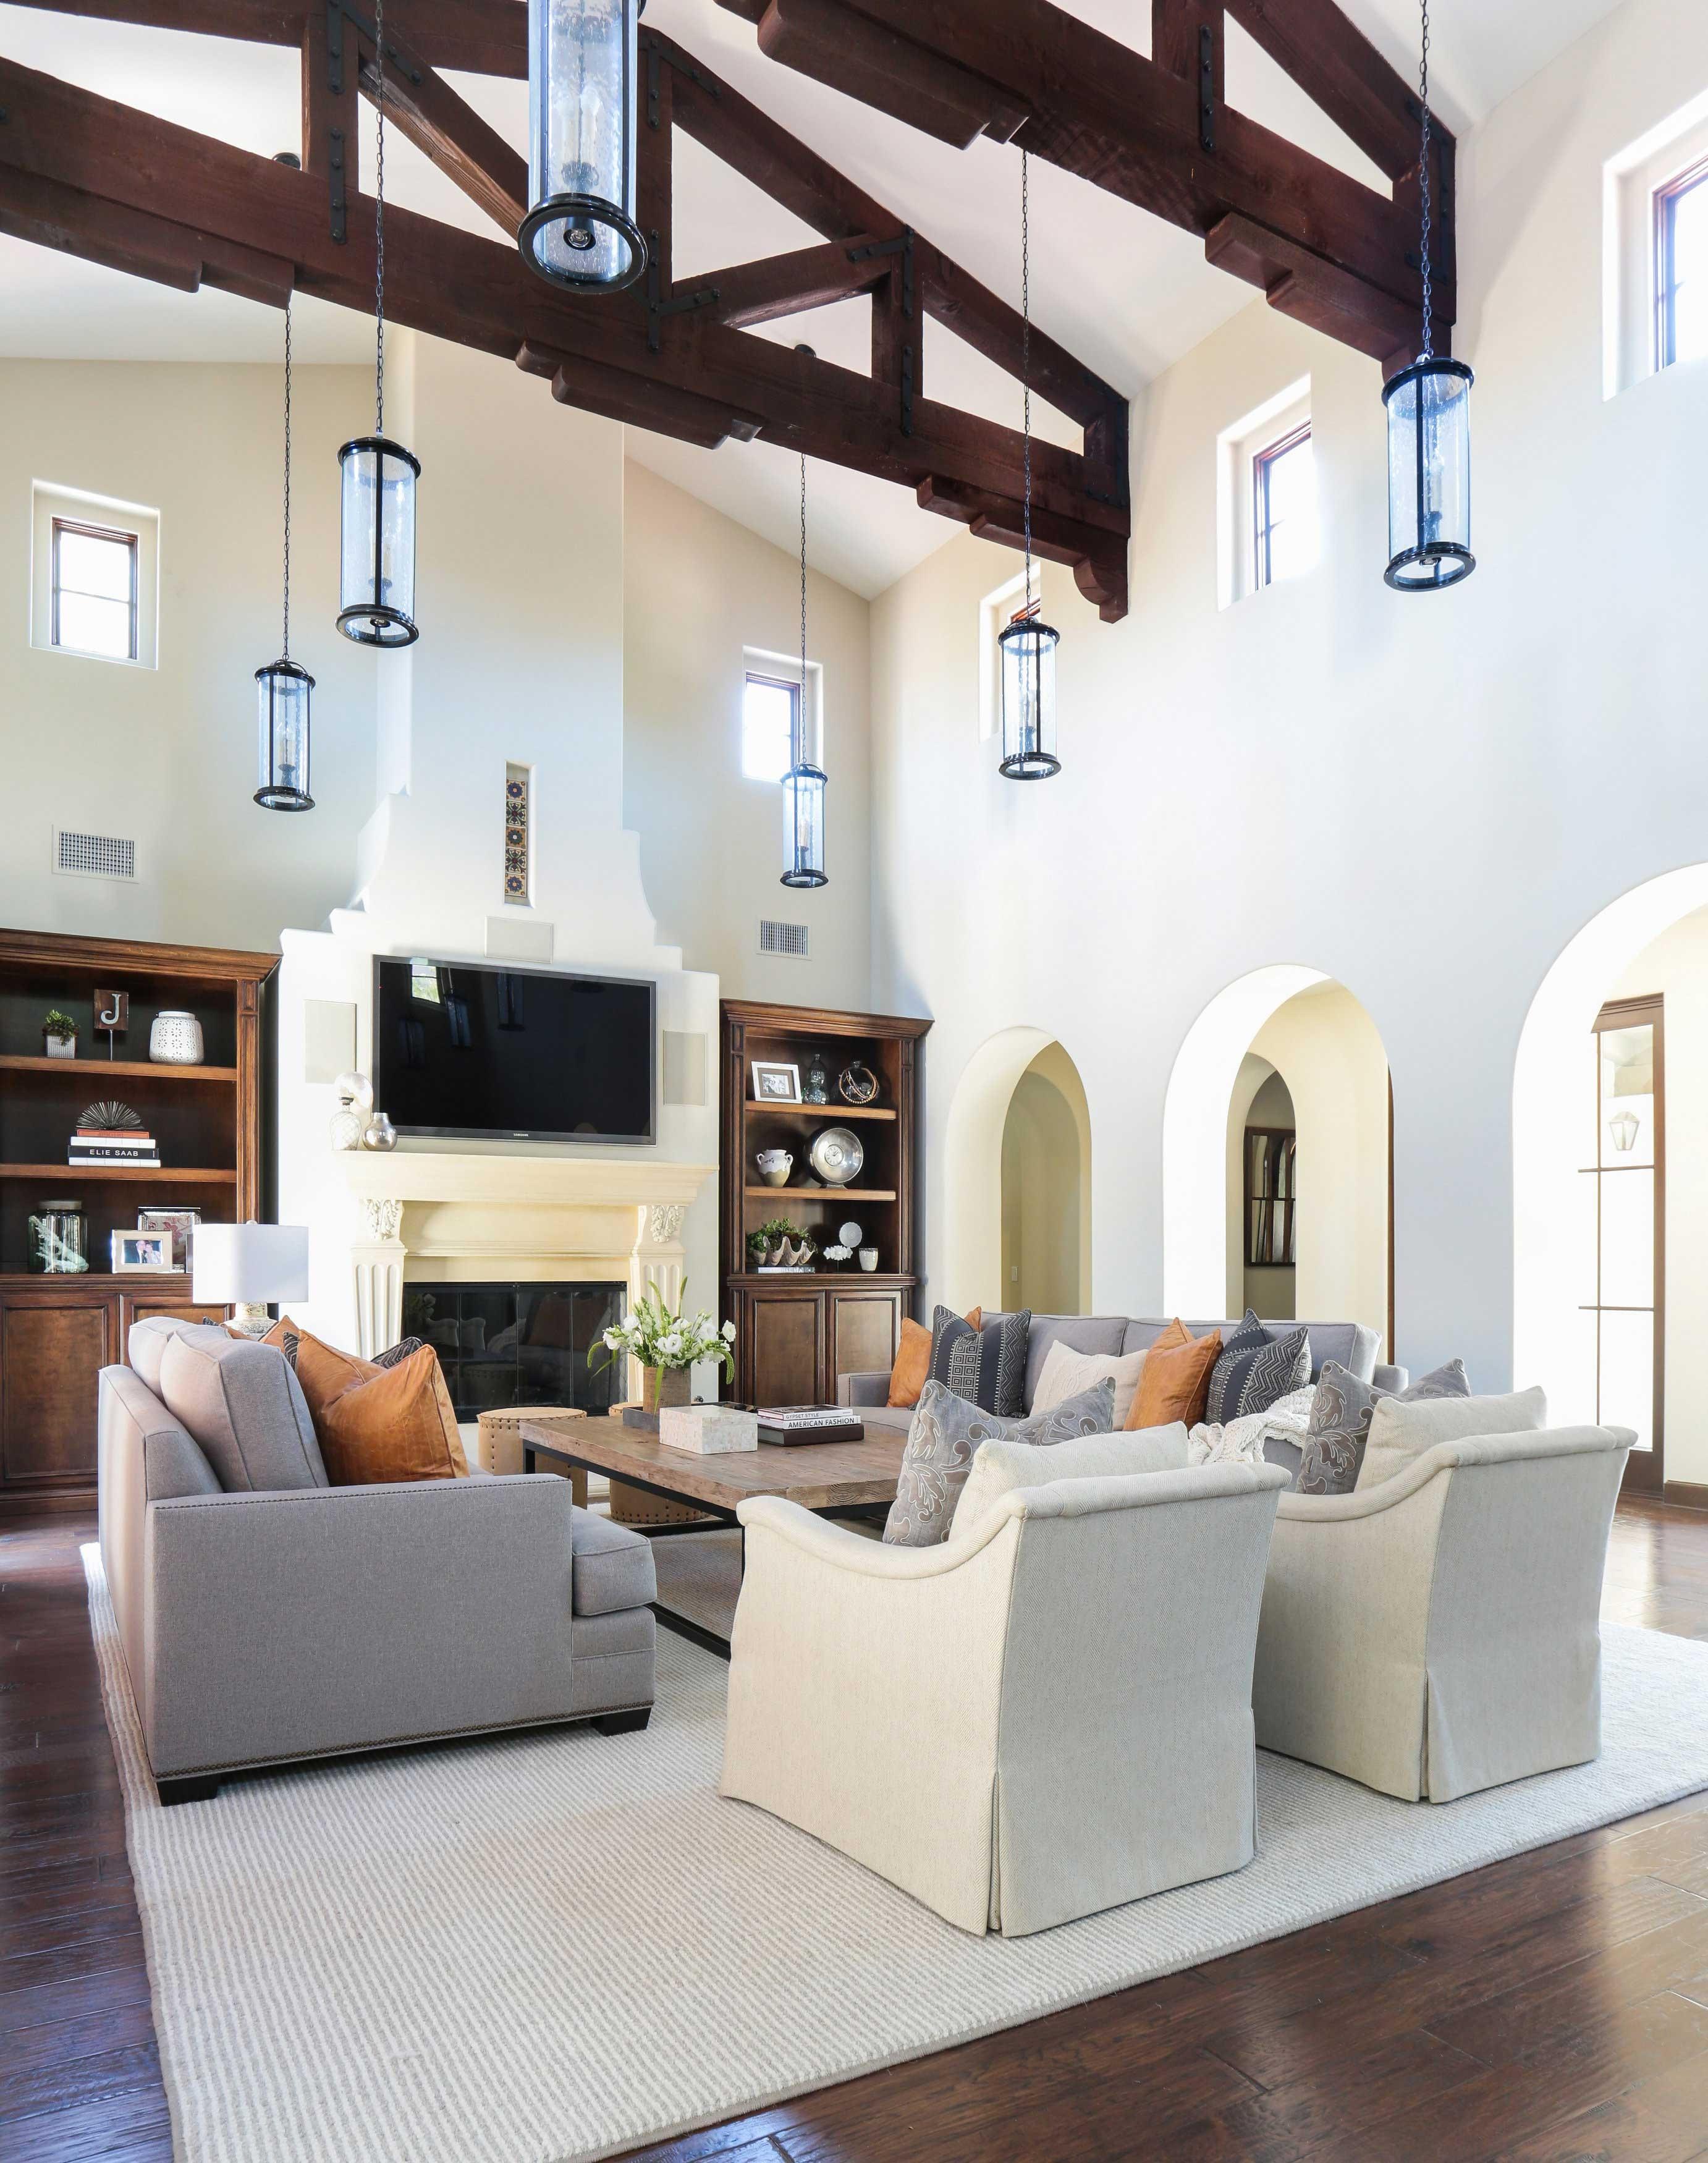 k significa living room en español Living Room: Sweet Living Room En Espanol With Double Brown Smooth  3500 X 2764